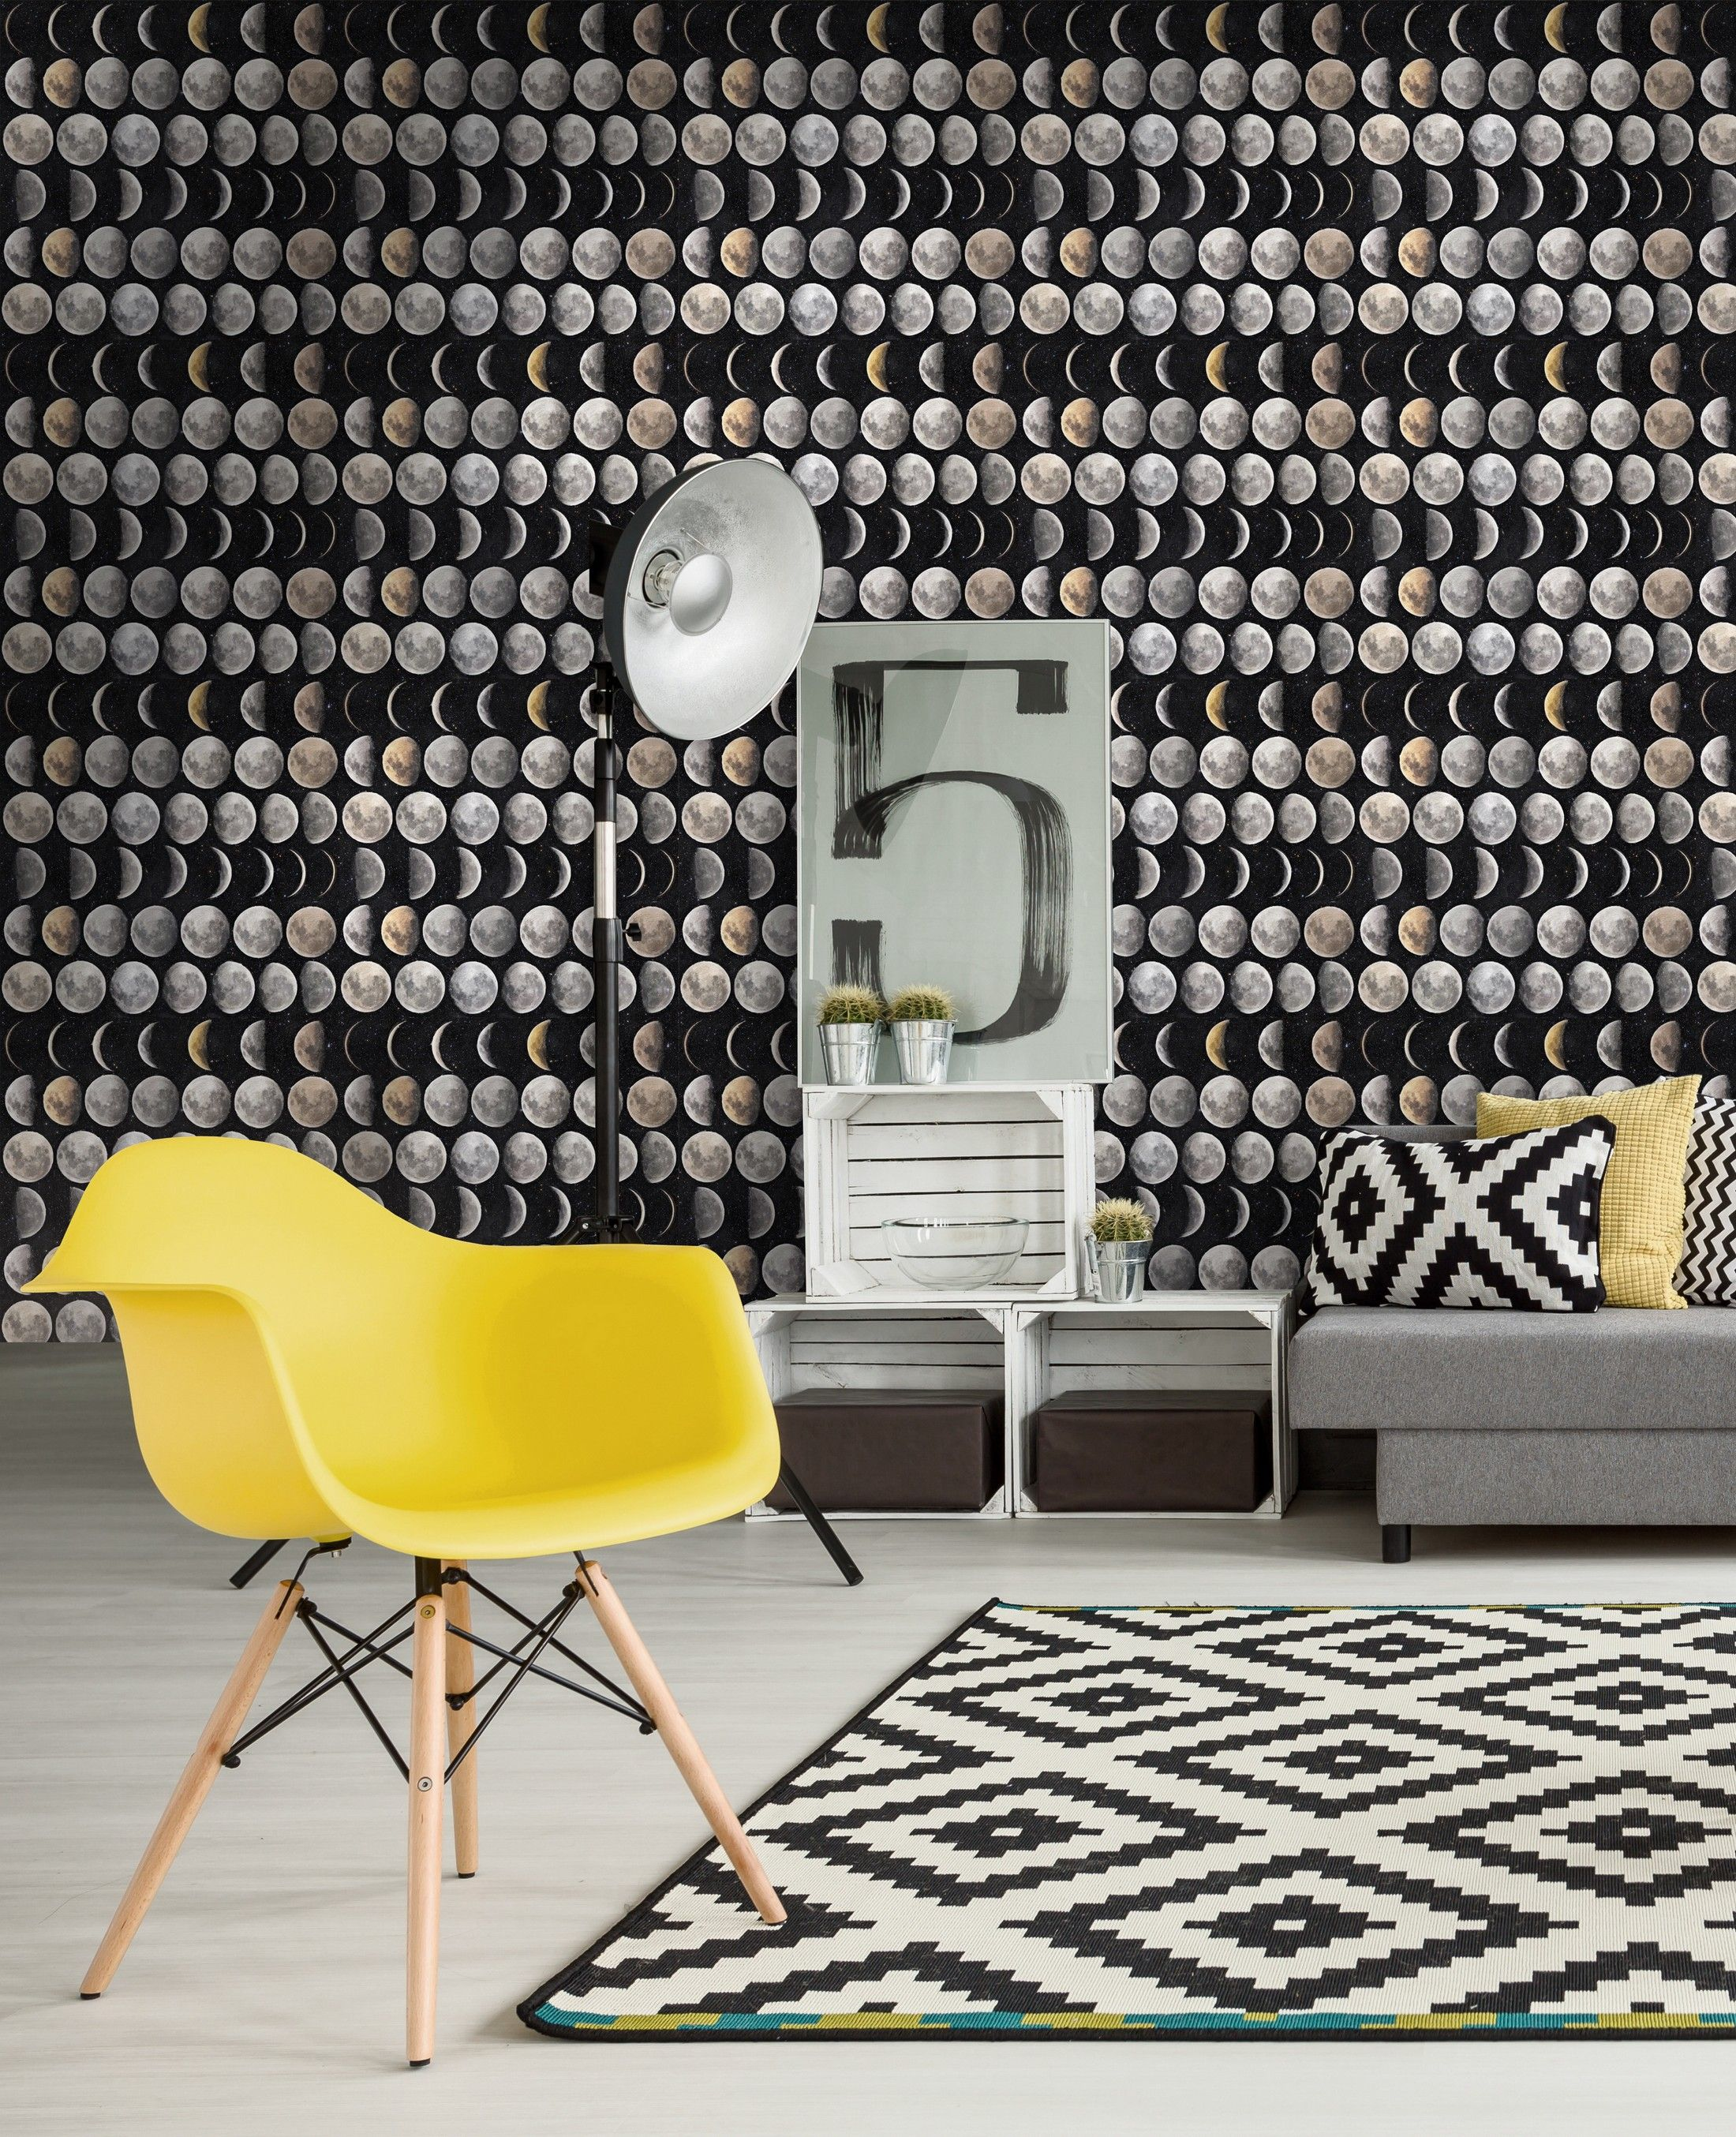 MOON PHASES Premium Wallpaper